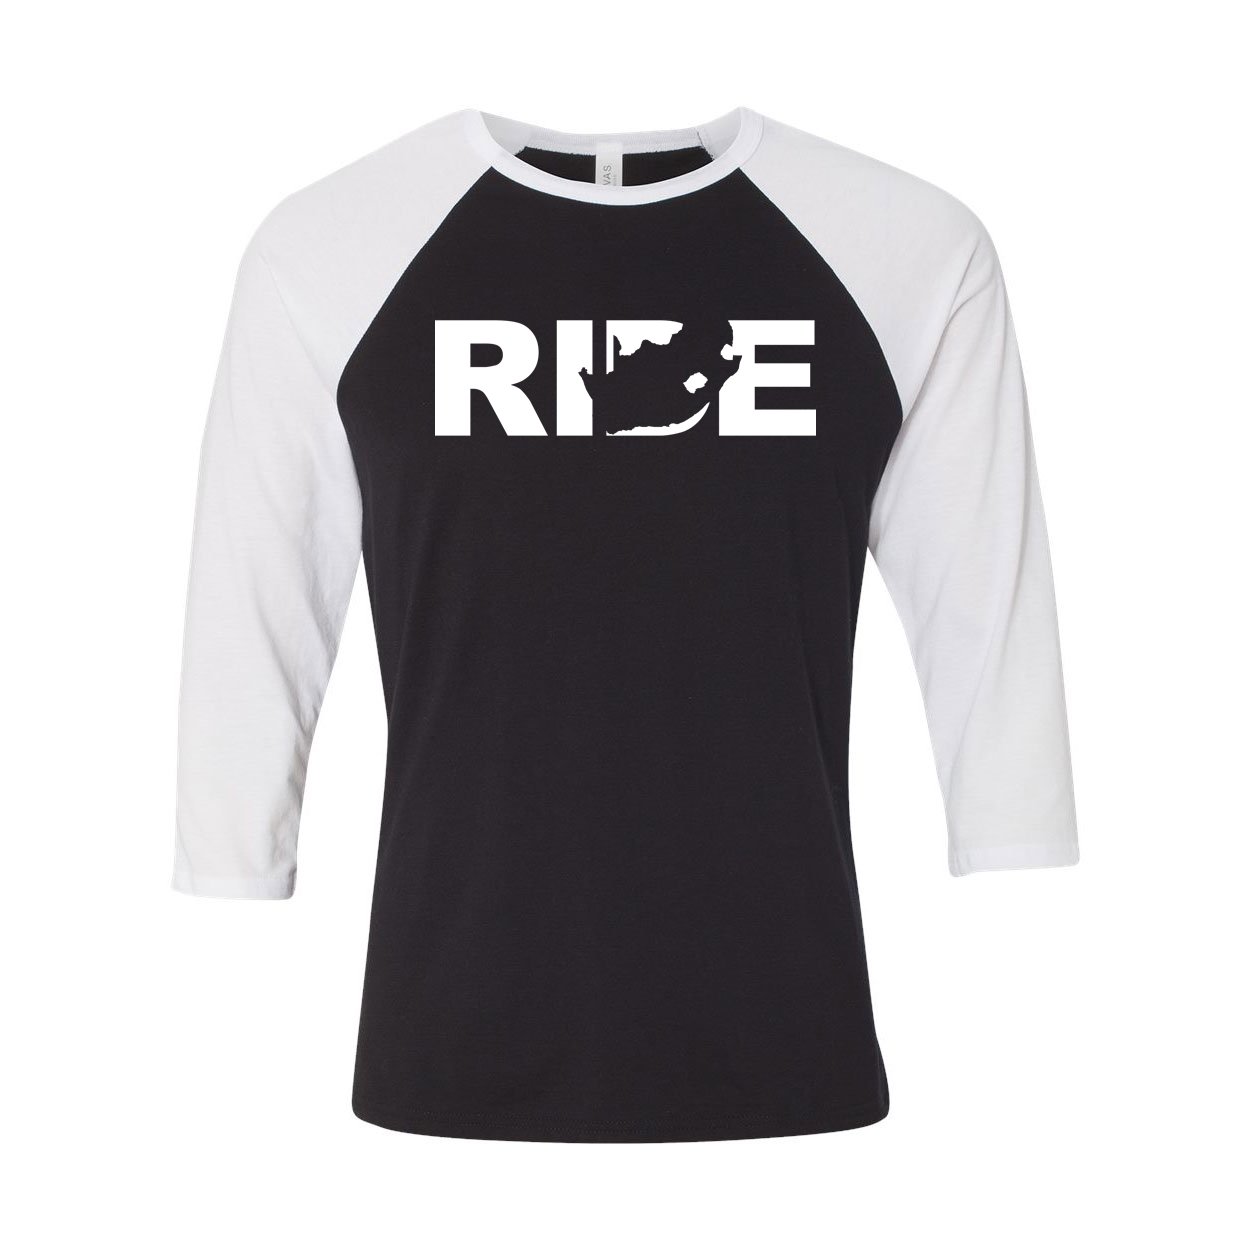 Ride South Africa Classic Raglan Shirt Black/White (White Logo)